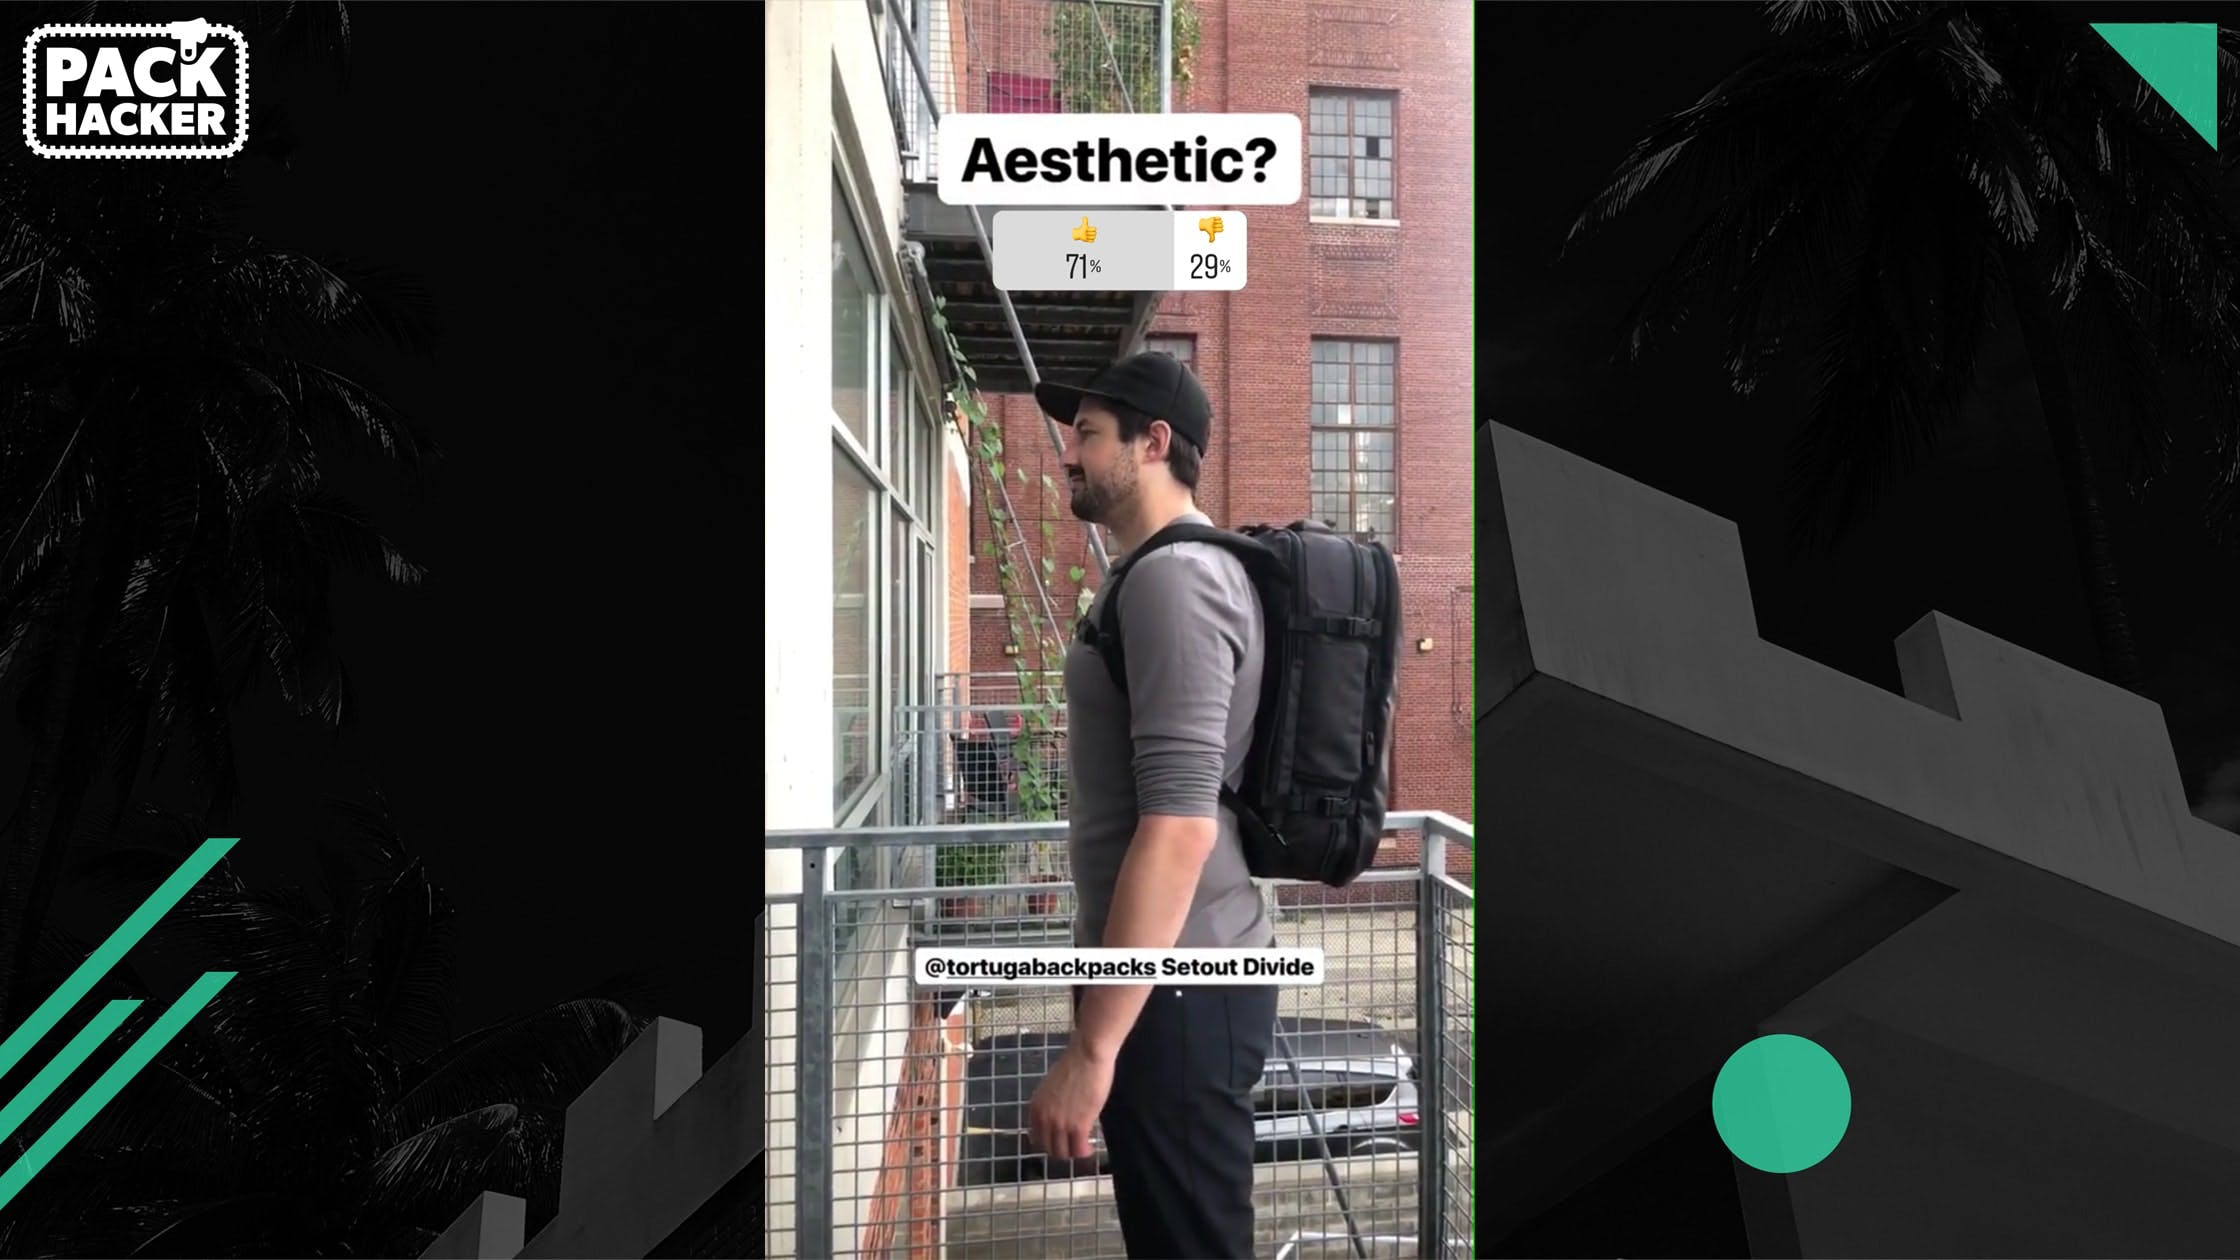 Tortuga Setout Divide Aesthetic Instagram Poll